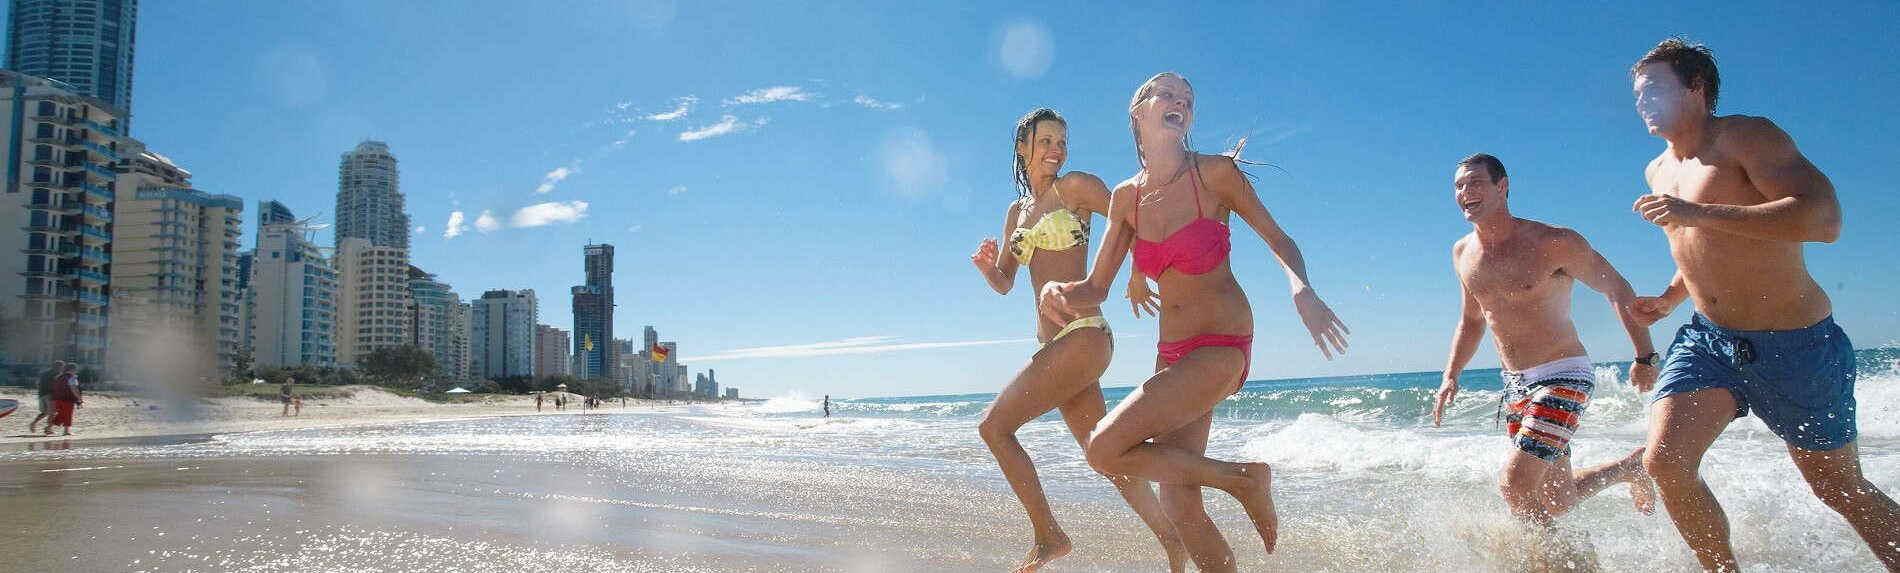 Brisbane and Gold Coast Tours